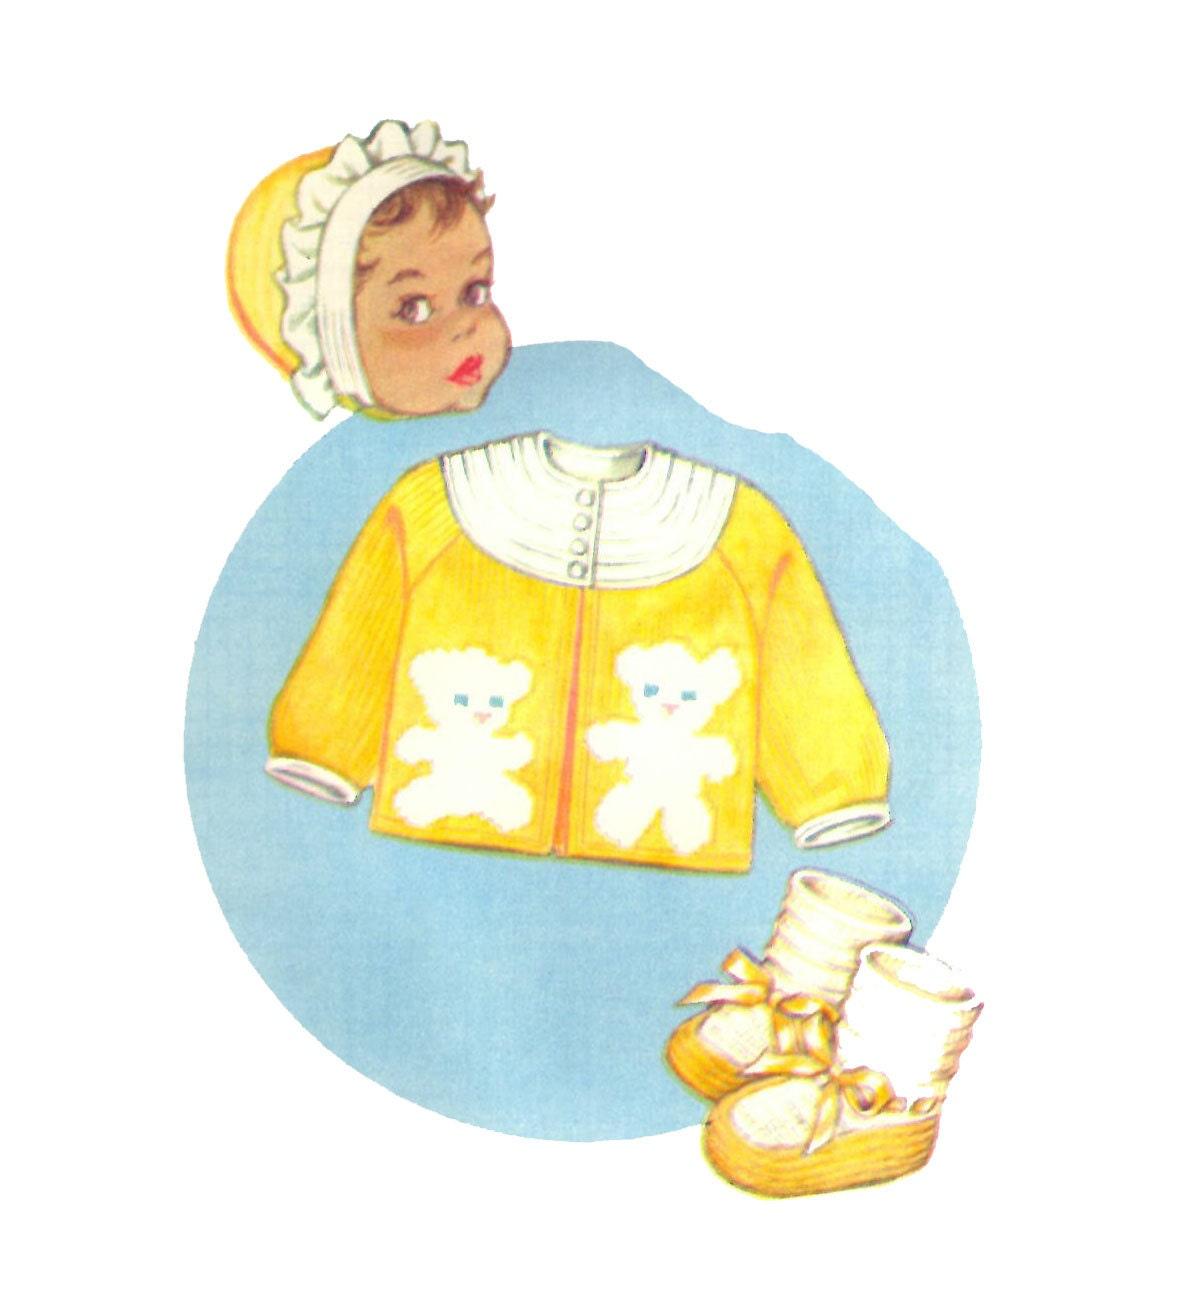 Knit O Graf PATTERN 222 Baby Sweater Set Cardigan Bonnet